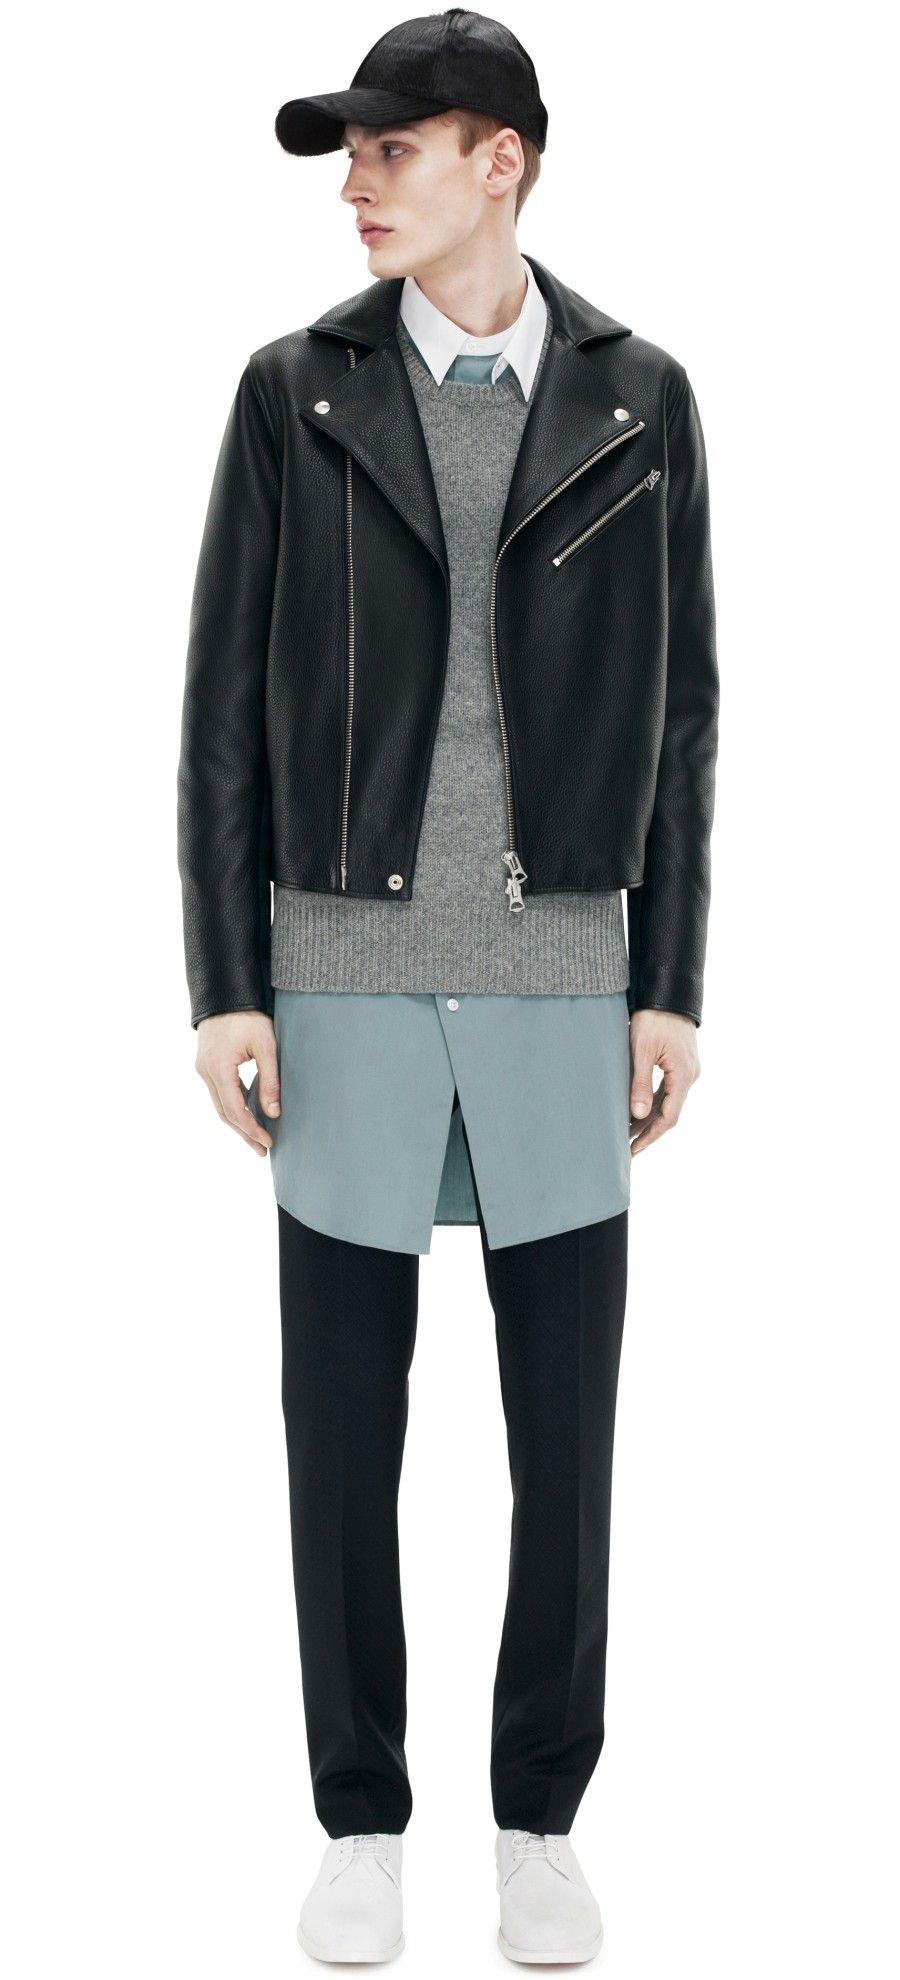 Acne Gibson Leather Black Lookbook men, Casual